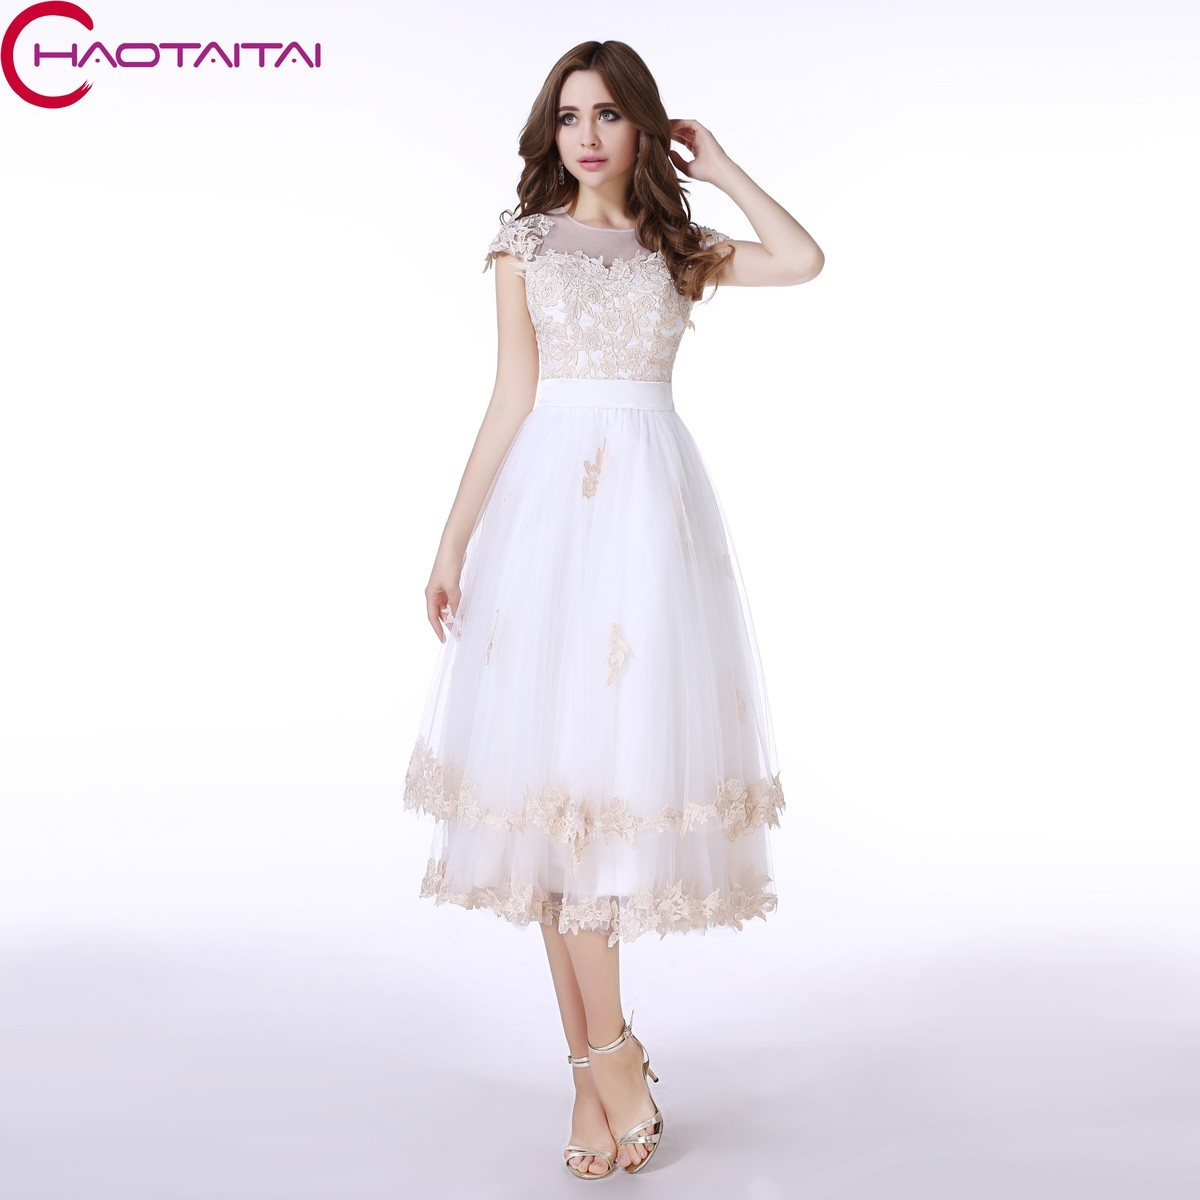 Online Get Cheap White Evening Dresses -Aliexpress.com | Alibaba Group